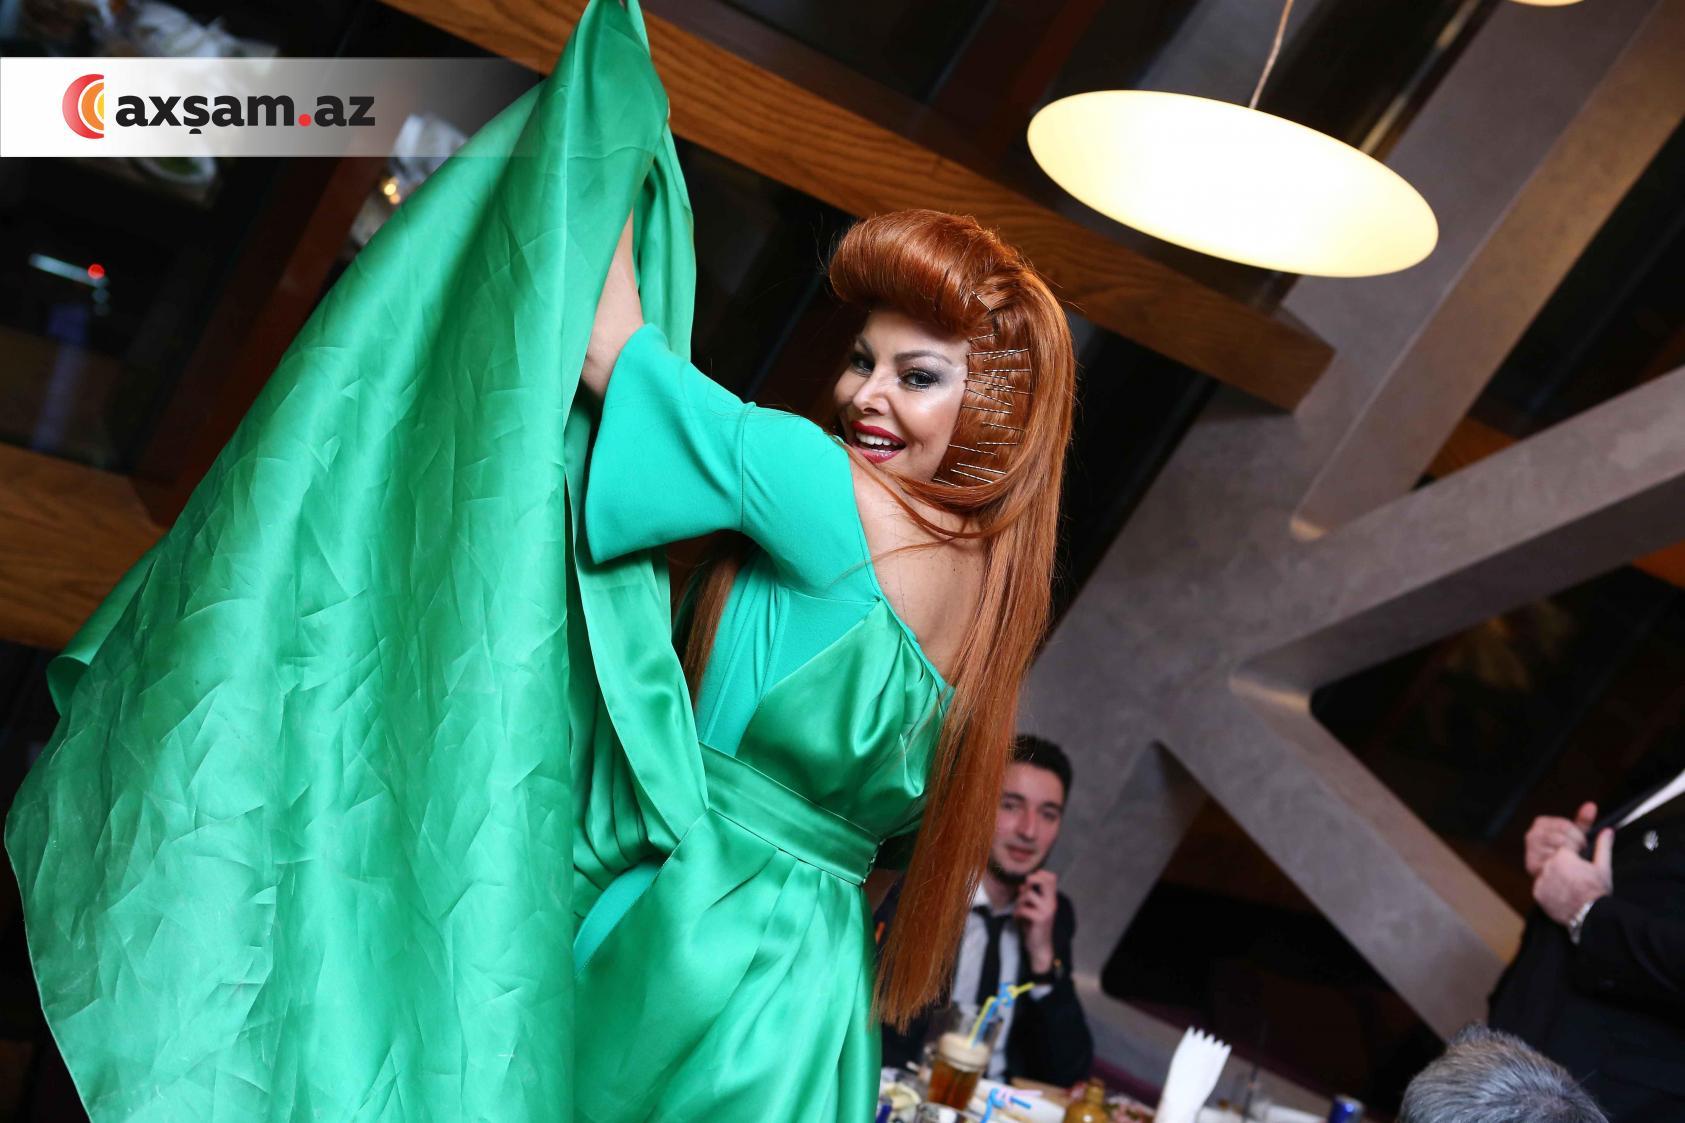 Секс айгуна казымова, Aygn Kazmova seks lt killr 5 фотография